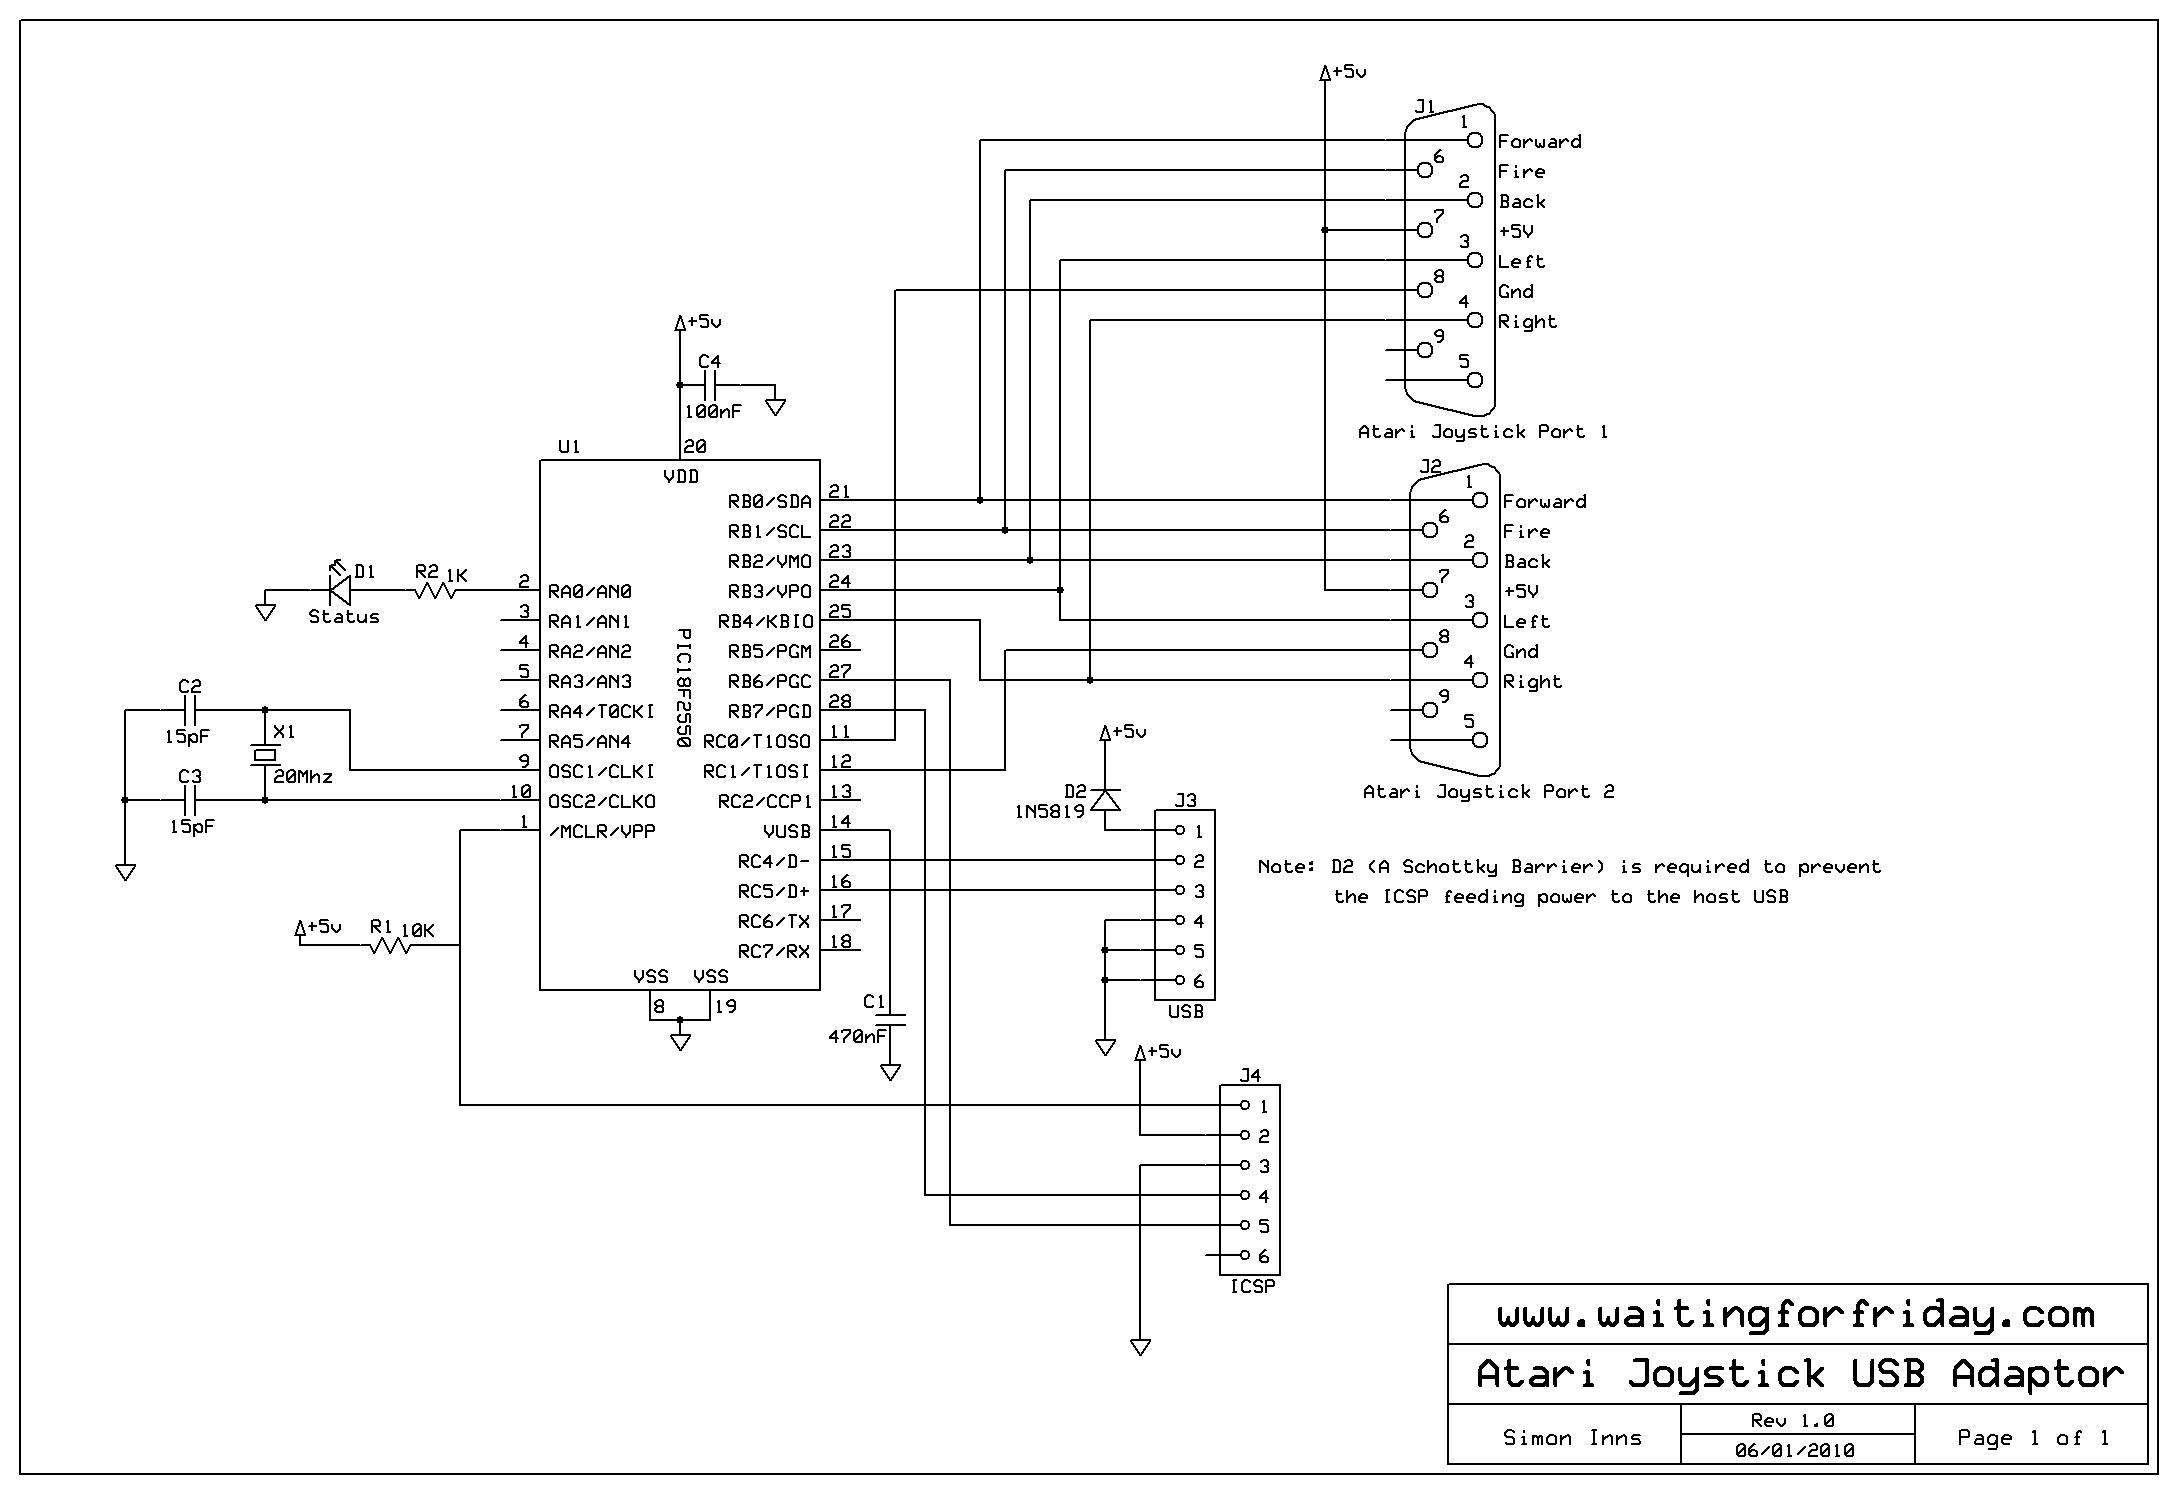 Atari Joystick Usb Adaptor Waiting For Friday Schematic Circuit And Pcb Artwork